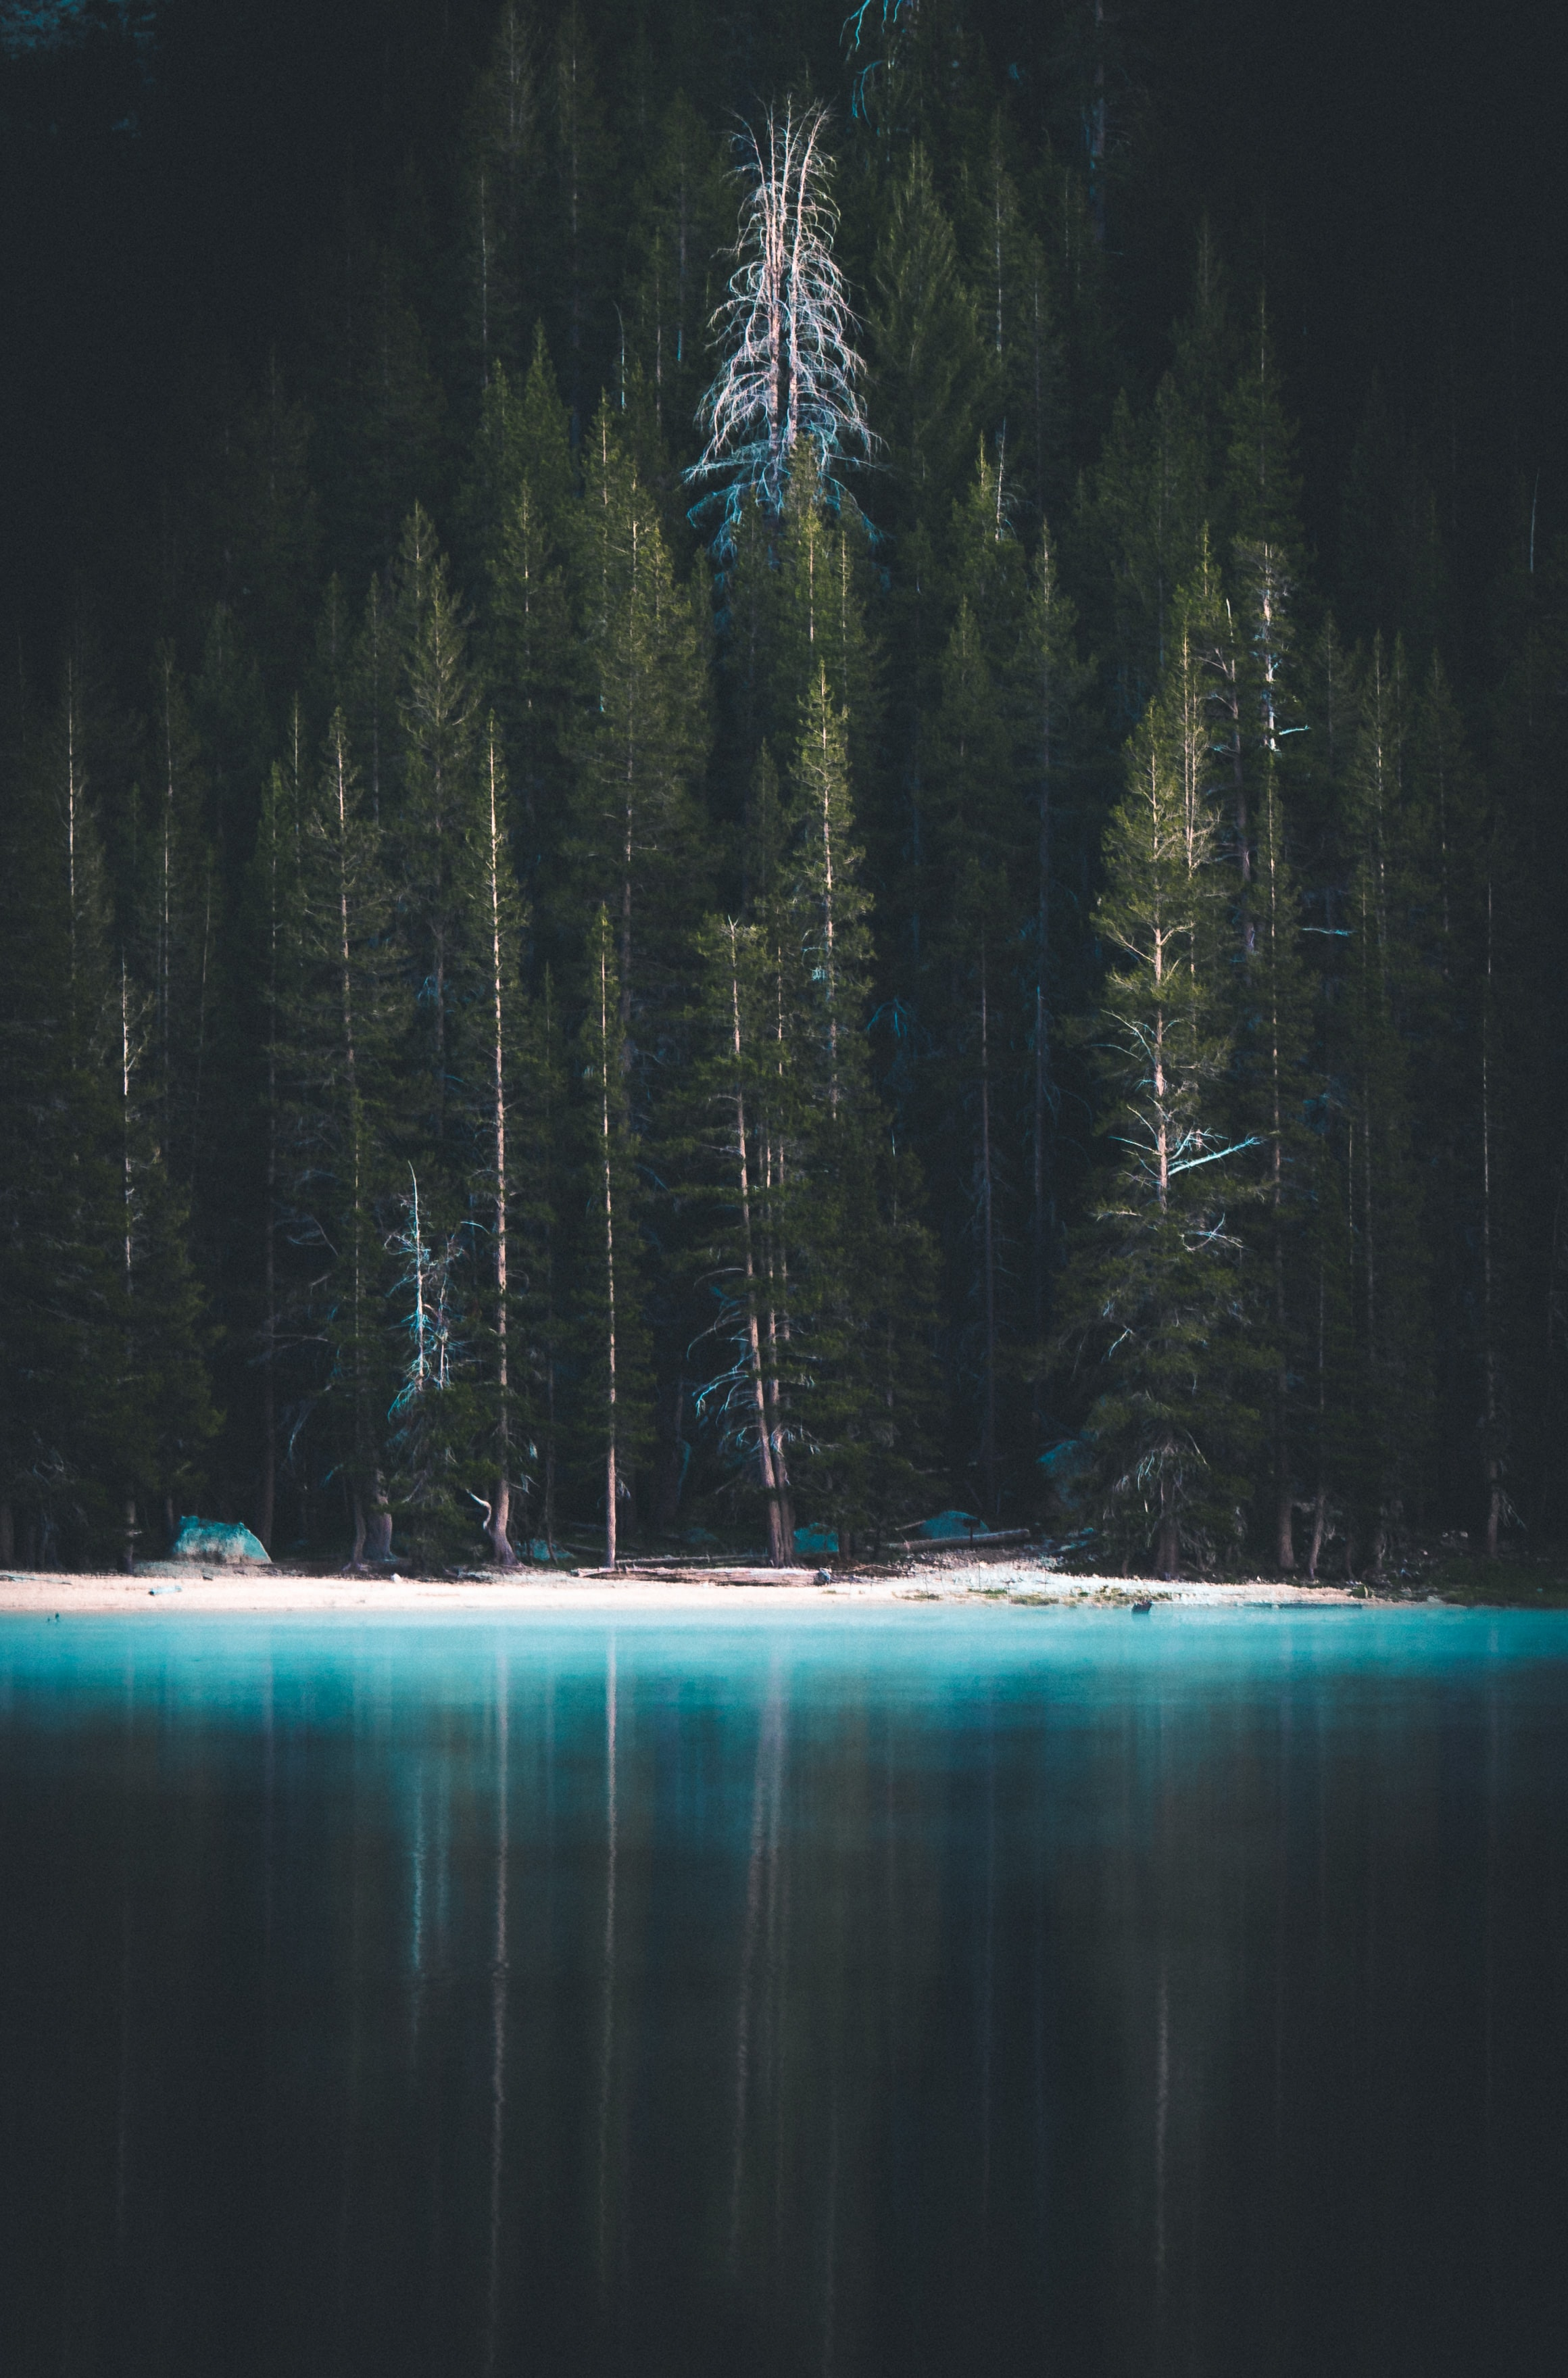 blue sea beside pine trees